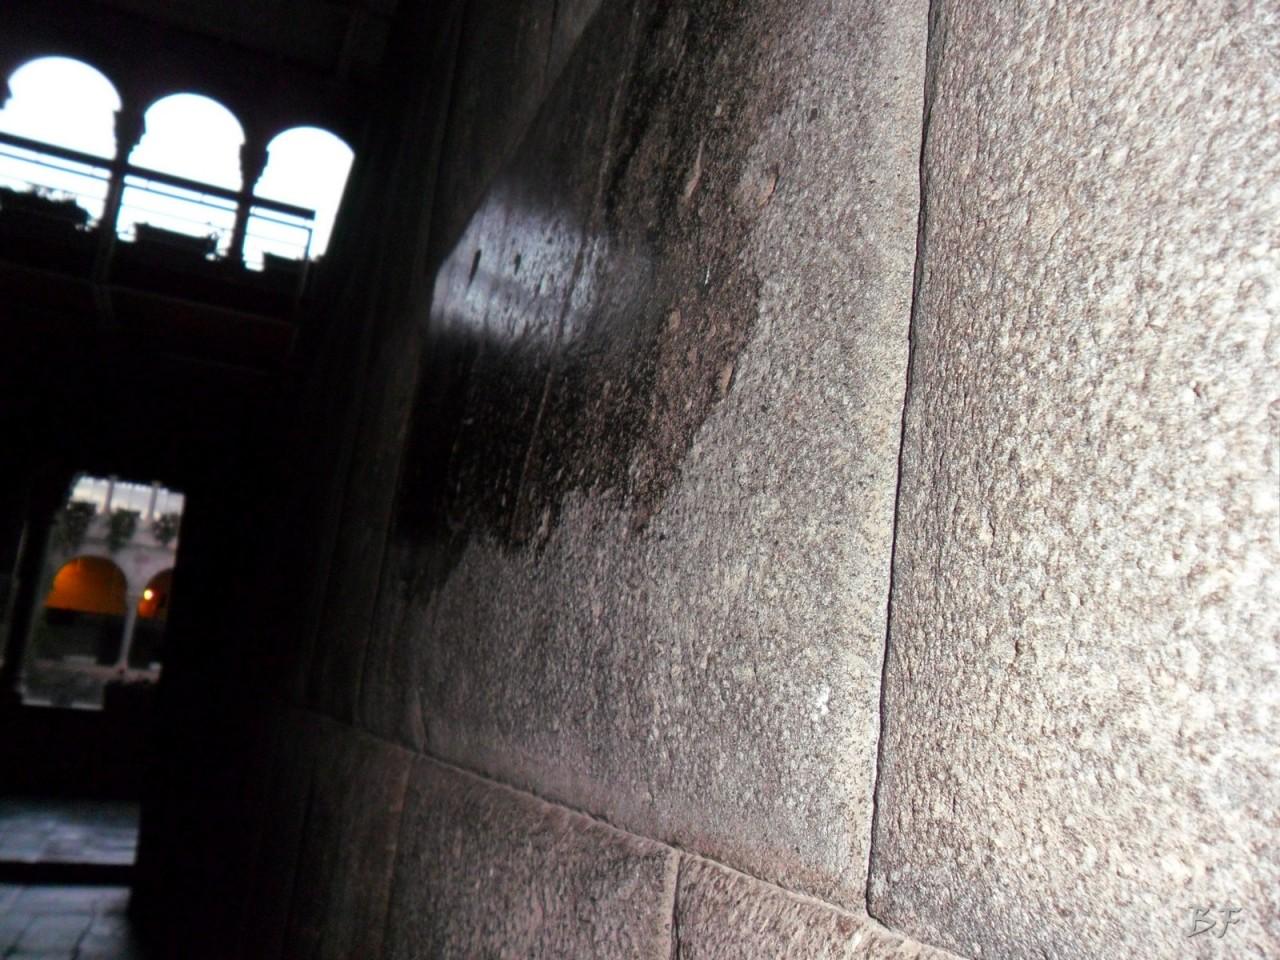 Mura-Poligonali-Megaliti-Tempio-Coricancha-Cusco-Perù-11